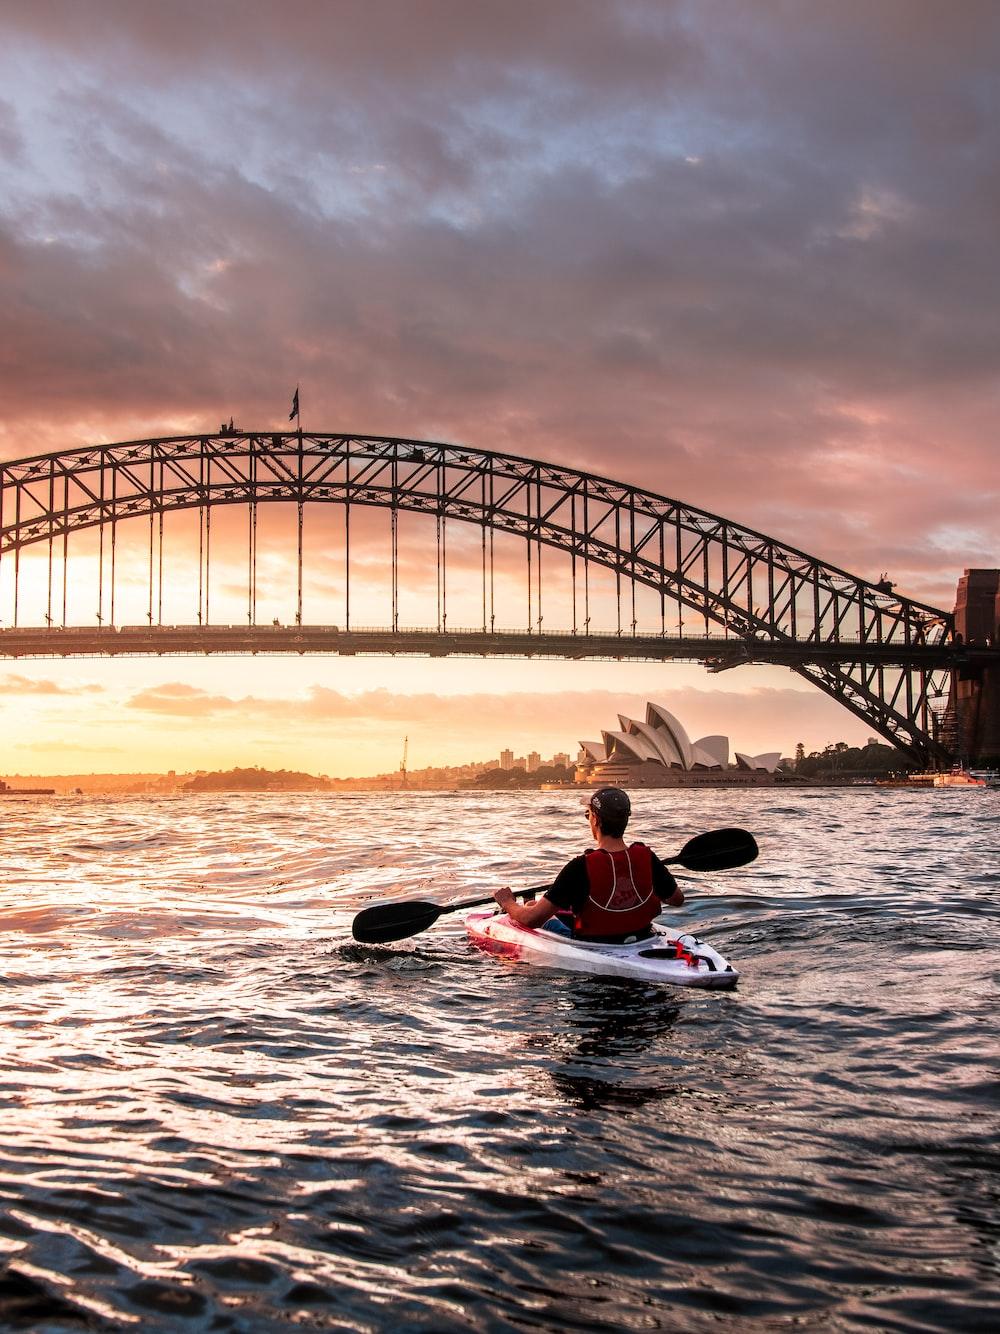 person riding kayak towards metal bridge